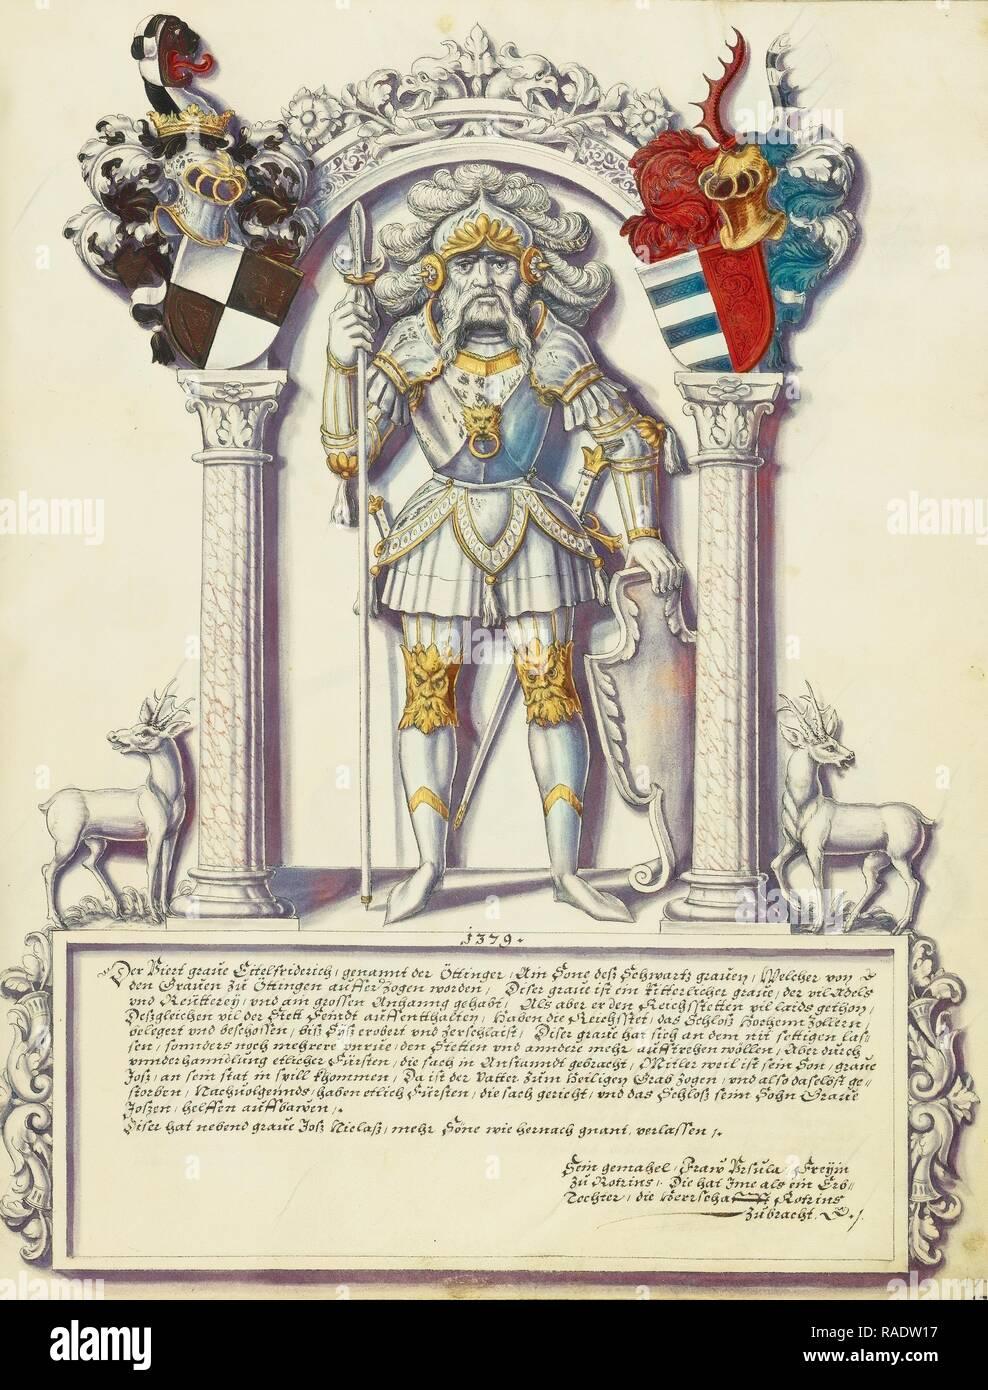 Eitelfriedrich IV Hohenzollern, Jörg Ziegler (German, early 16th century - 1574,1577), Rottenburg, Germany, about reimagined - Stock Image